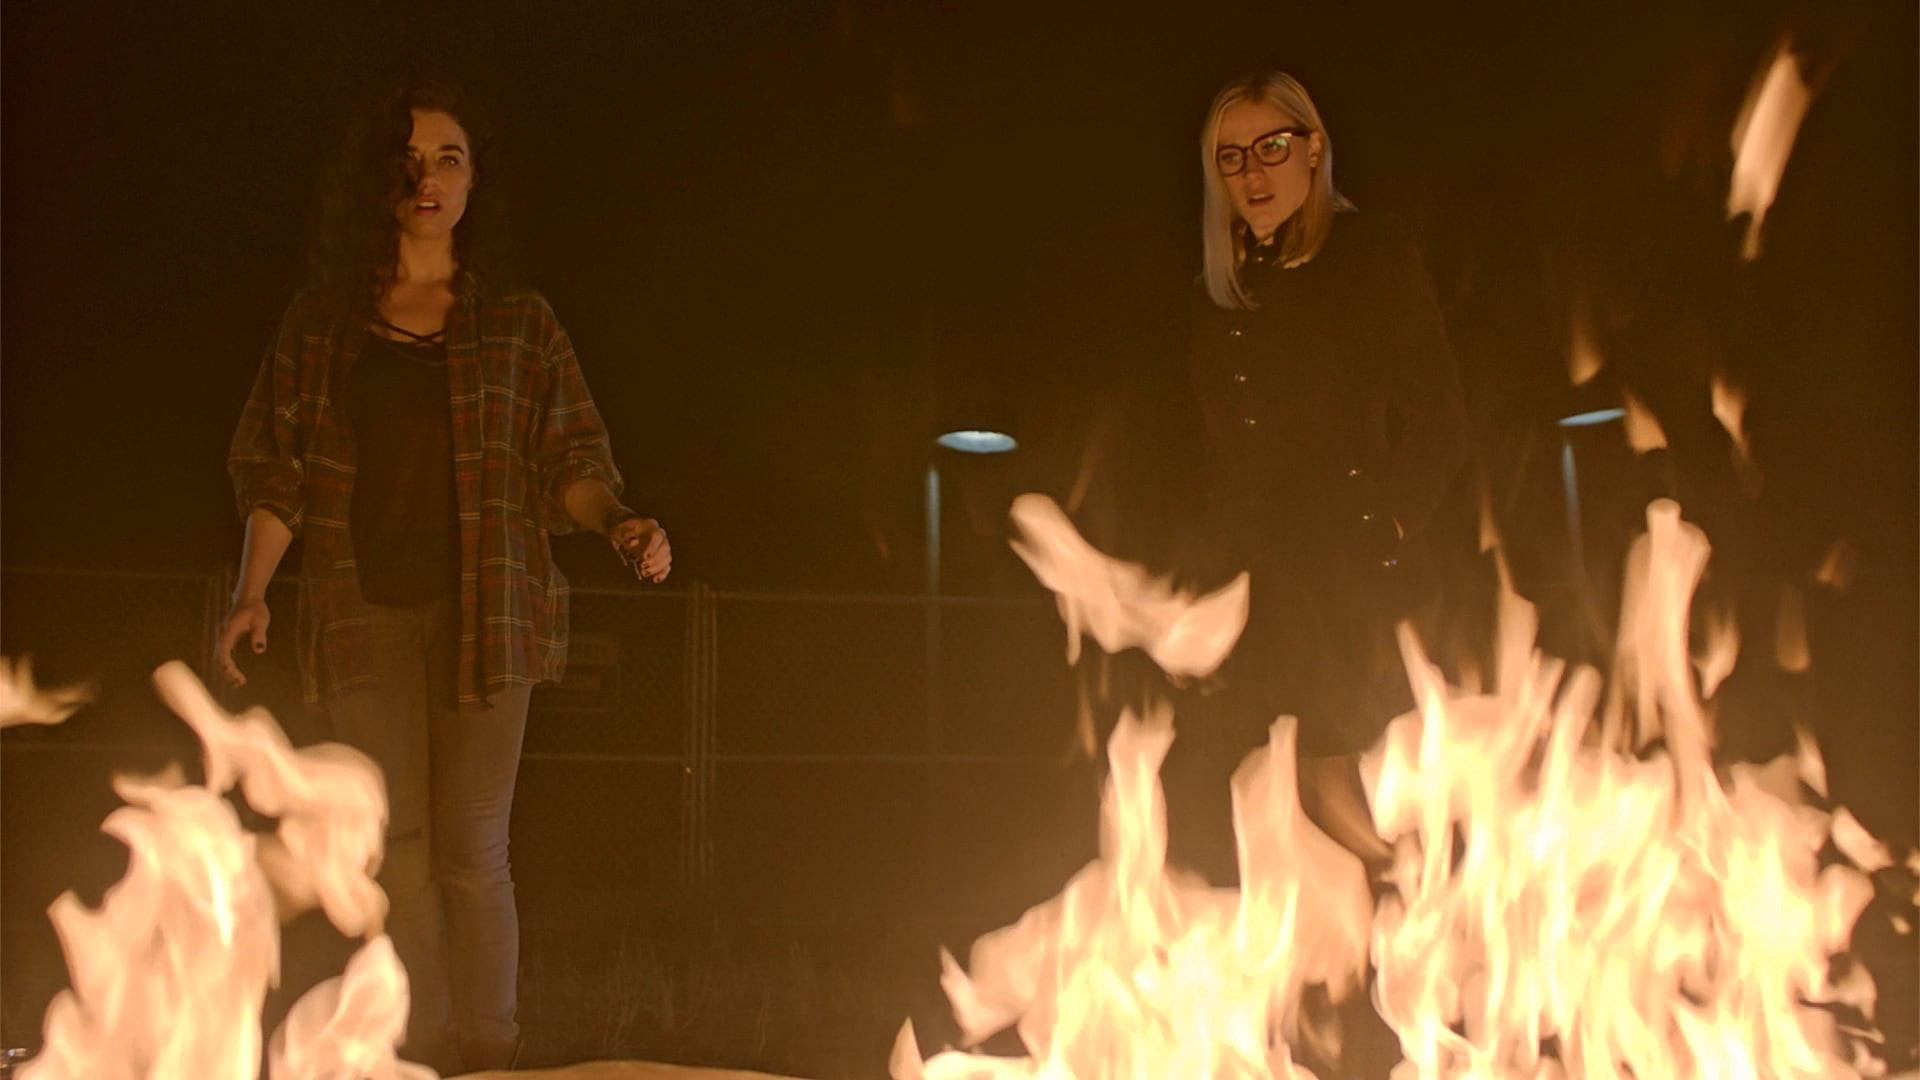 Penny's body burns.